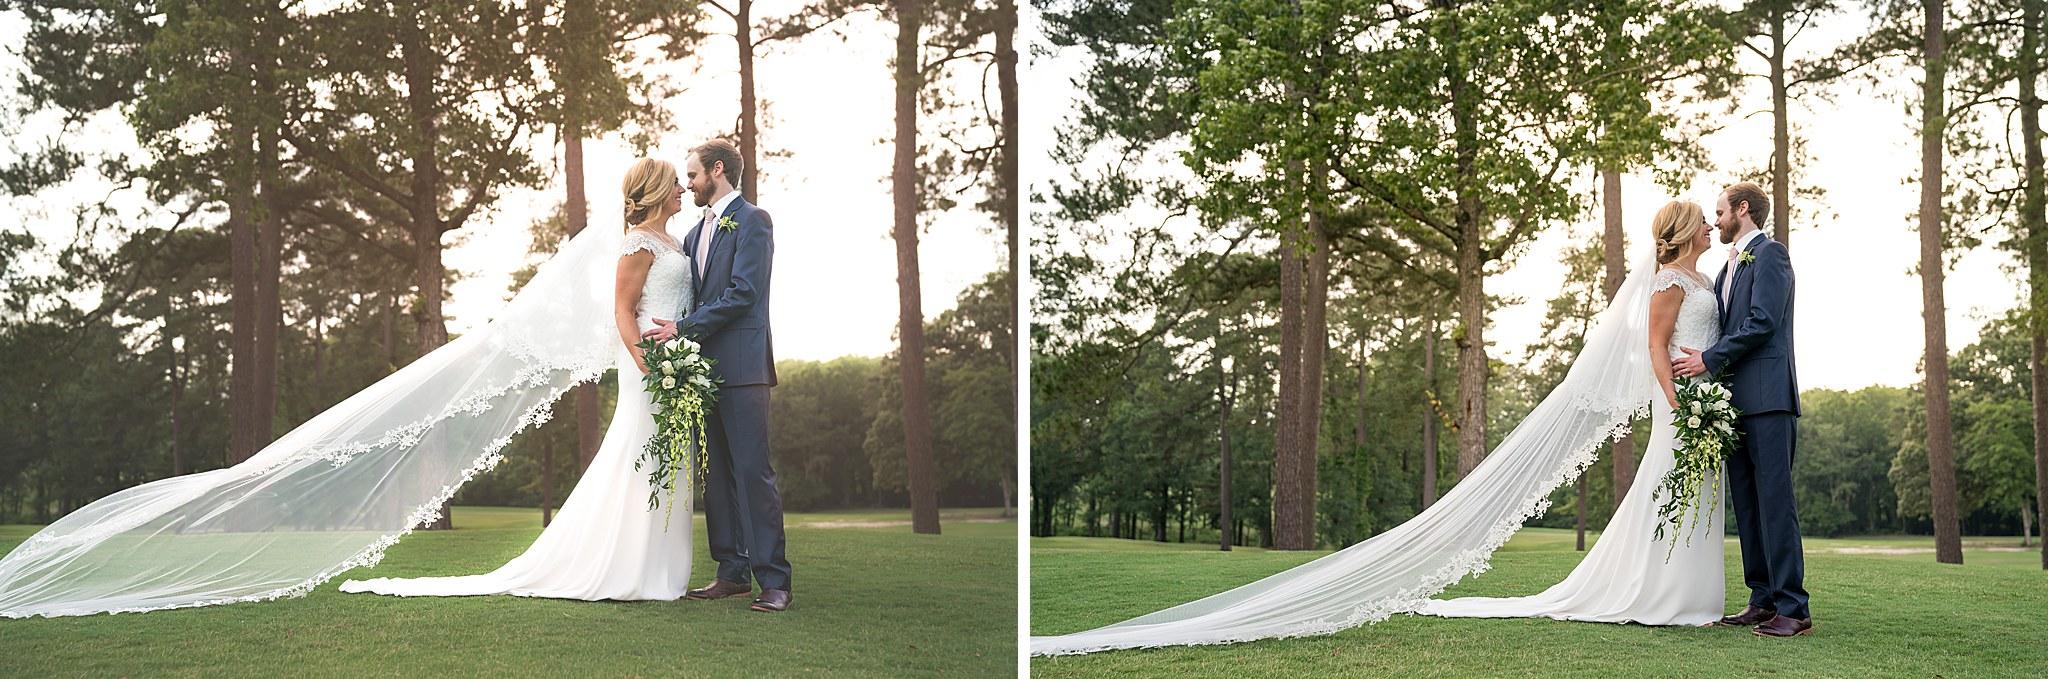 Williamston-NC-Wedding-Photographer 0003.jpg